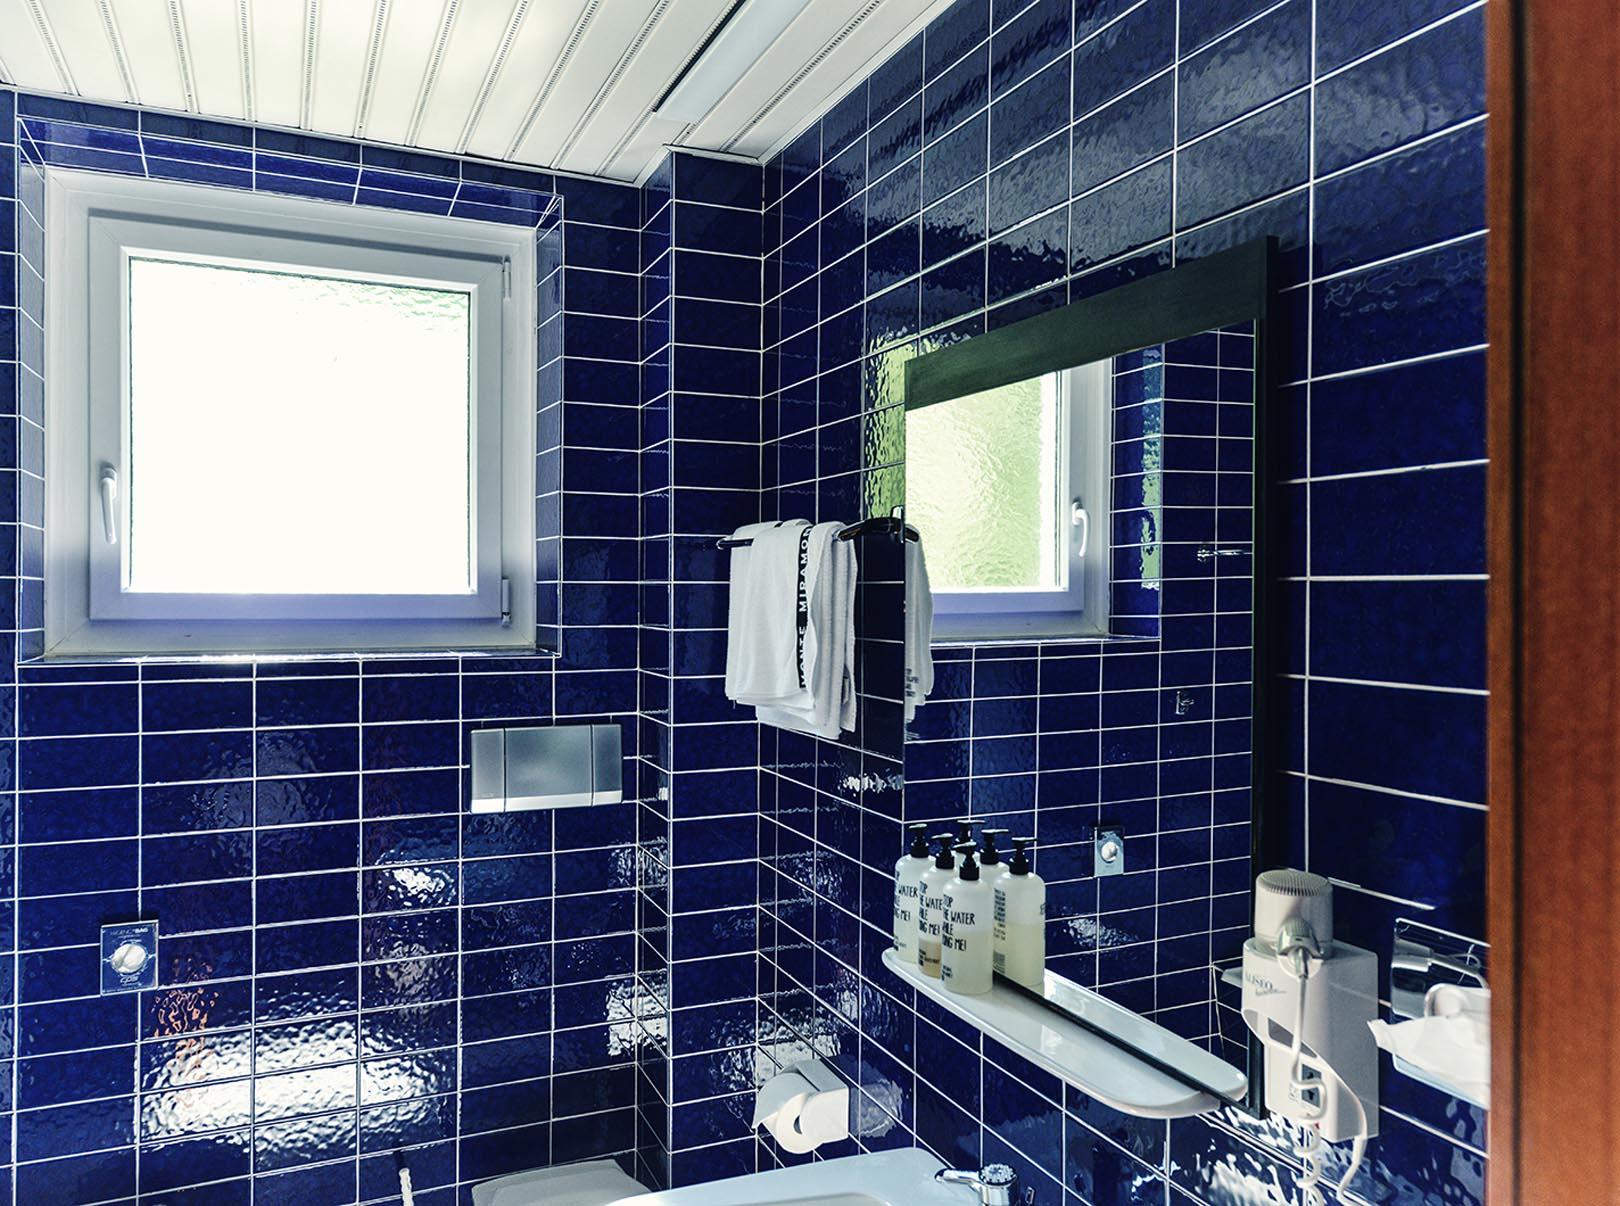 designhotel-miramonte-bad-gastein-inside-robert-kittel-3.jpg